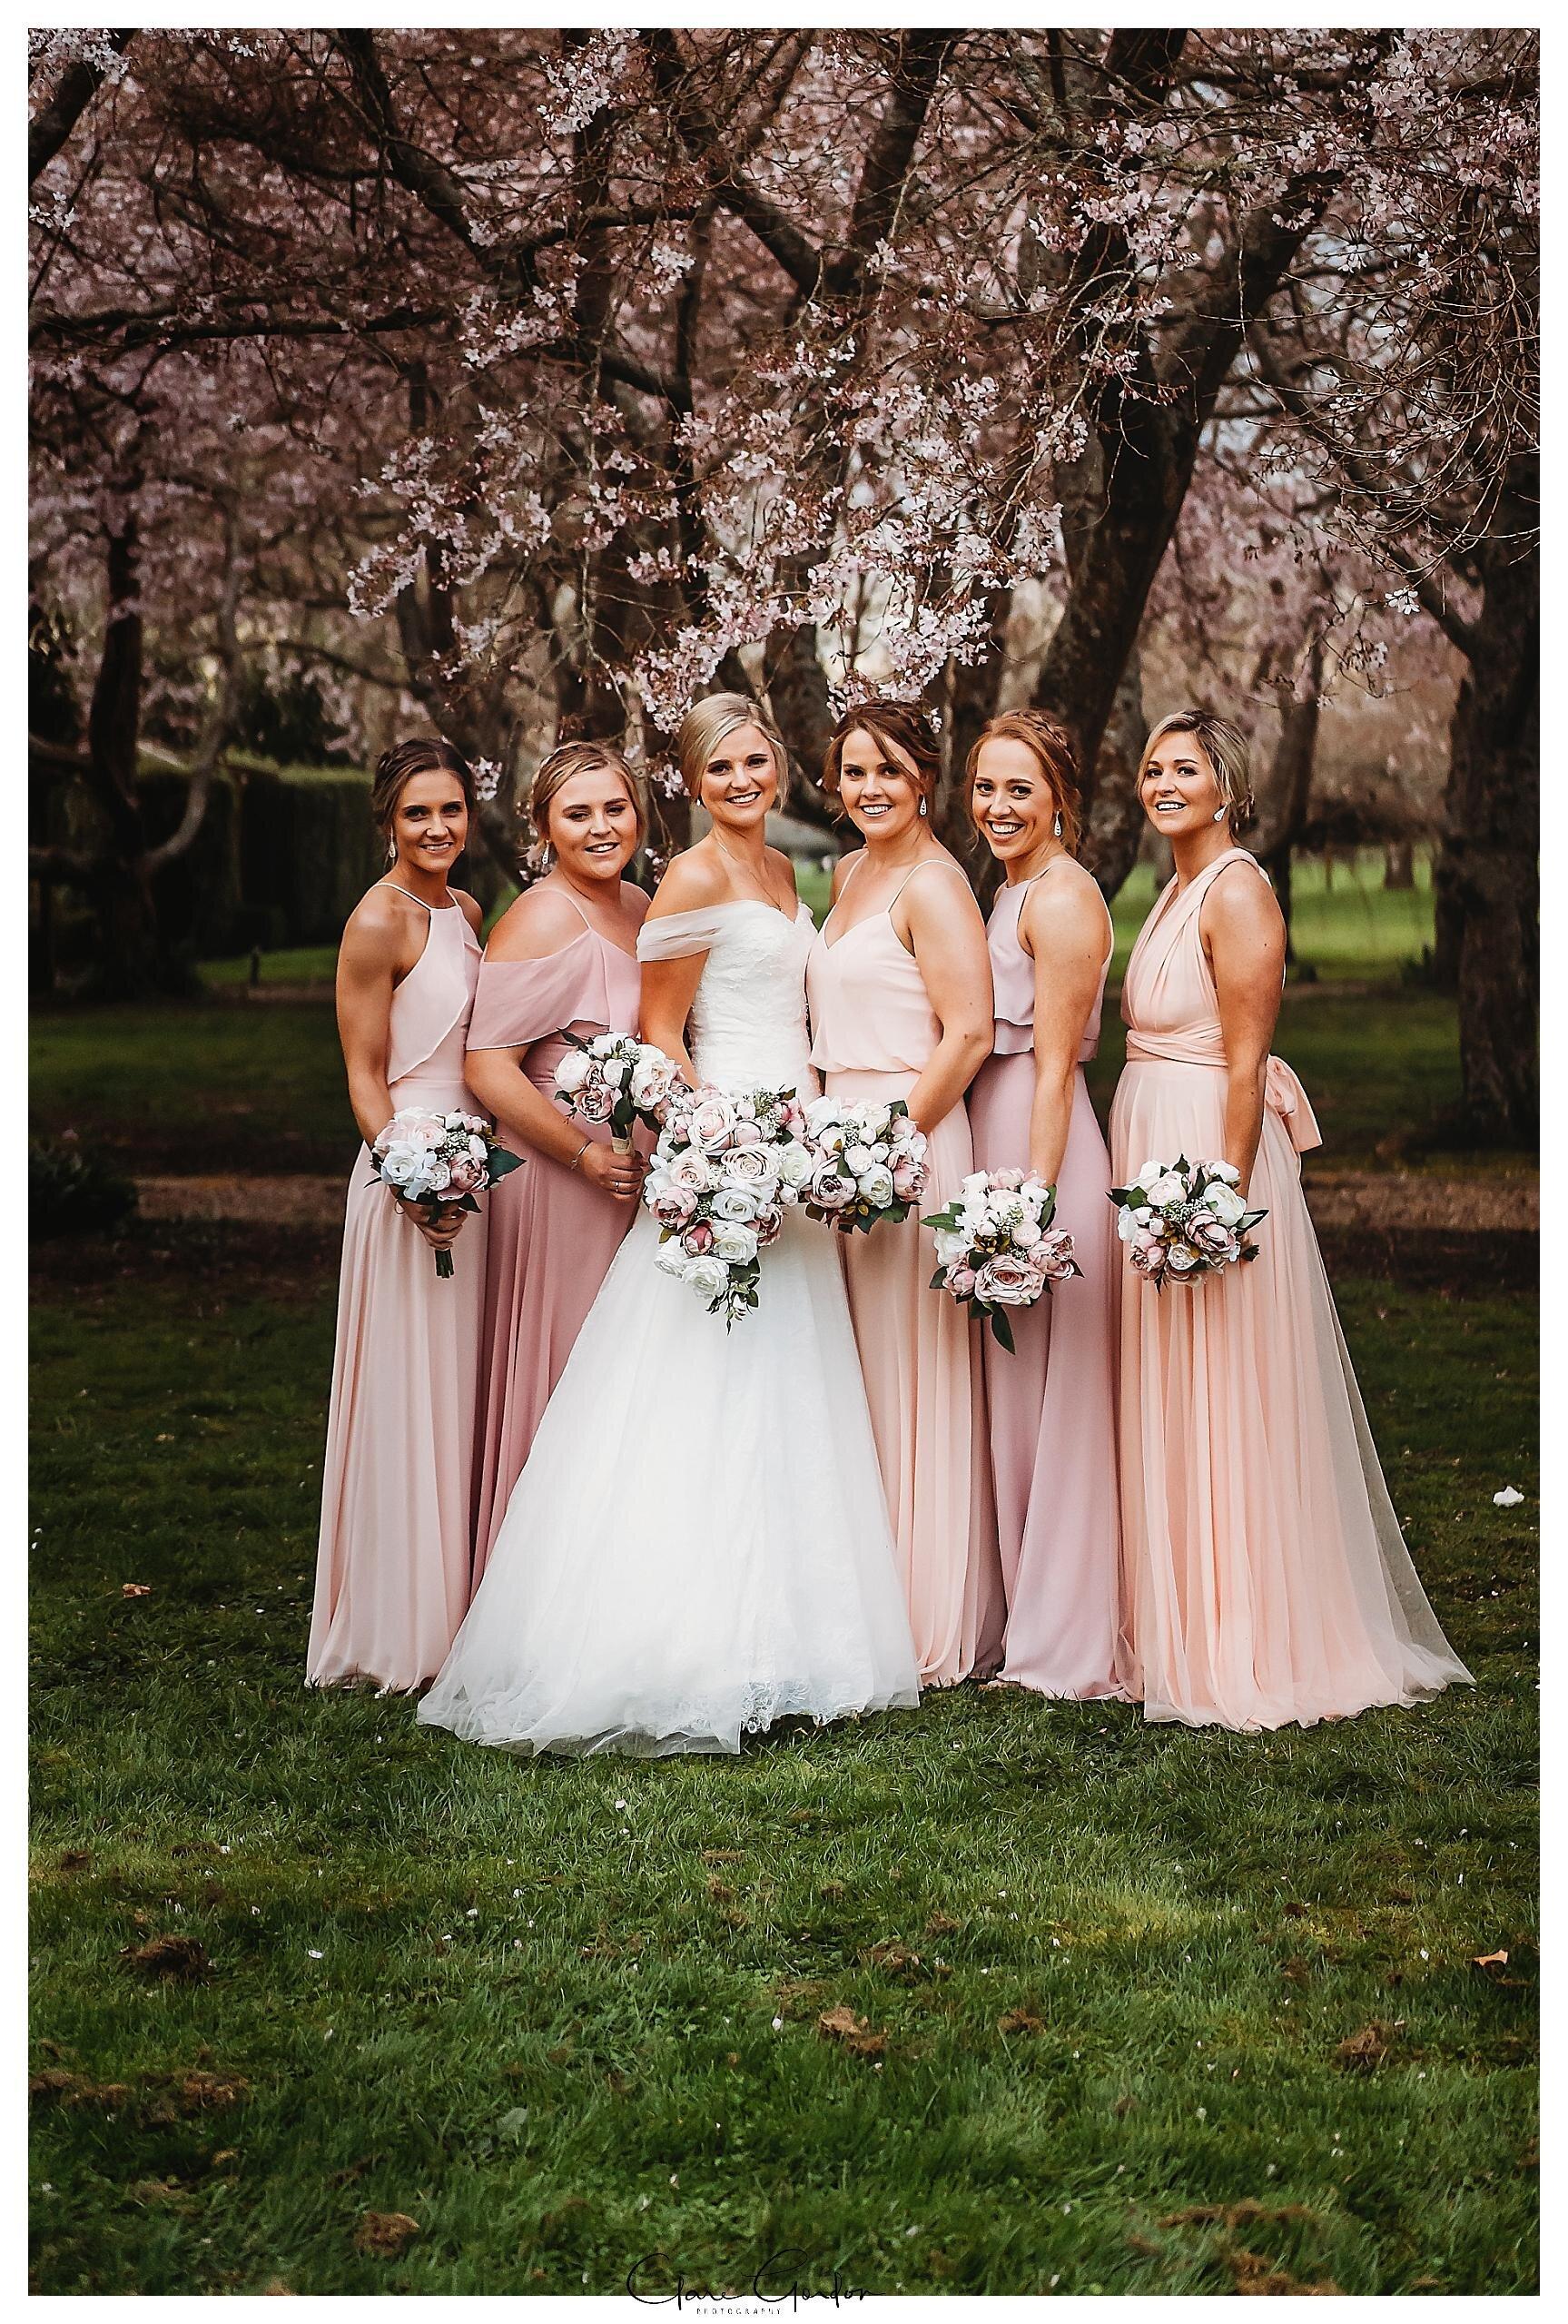 Henley-Hotel-Cherry-blossom-wedding-photos (64).jpg